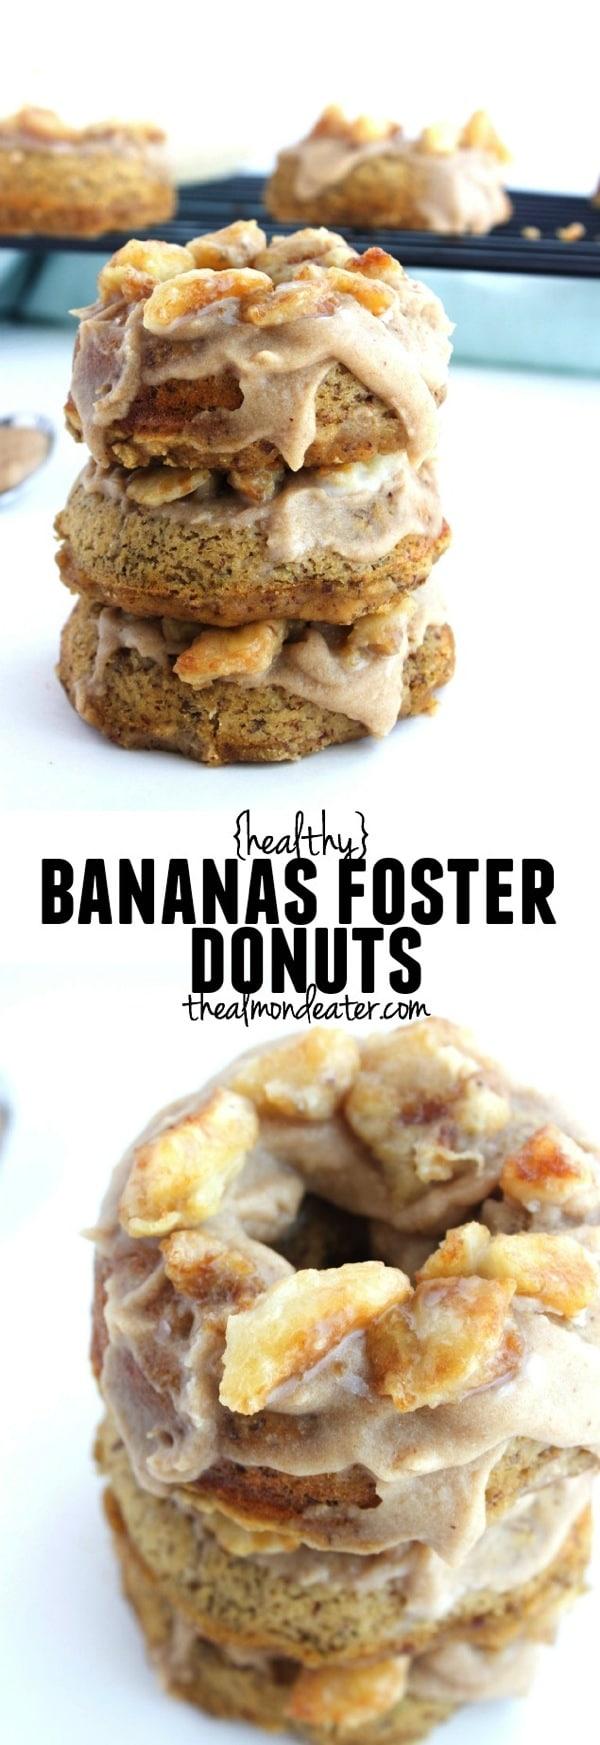 Bananas Foster donuts 123